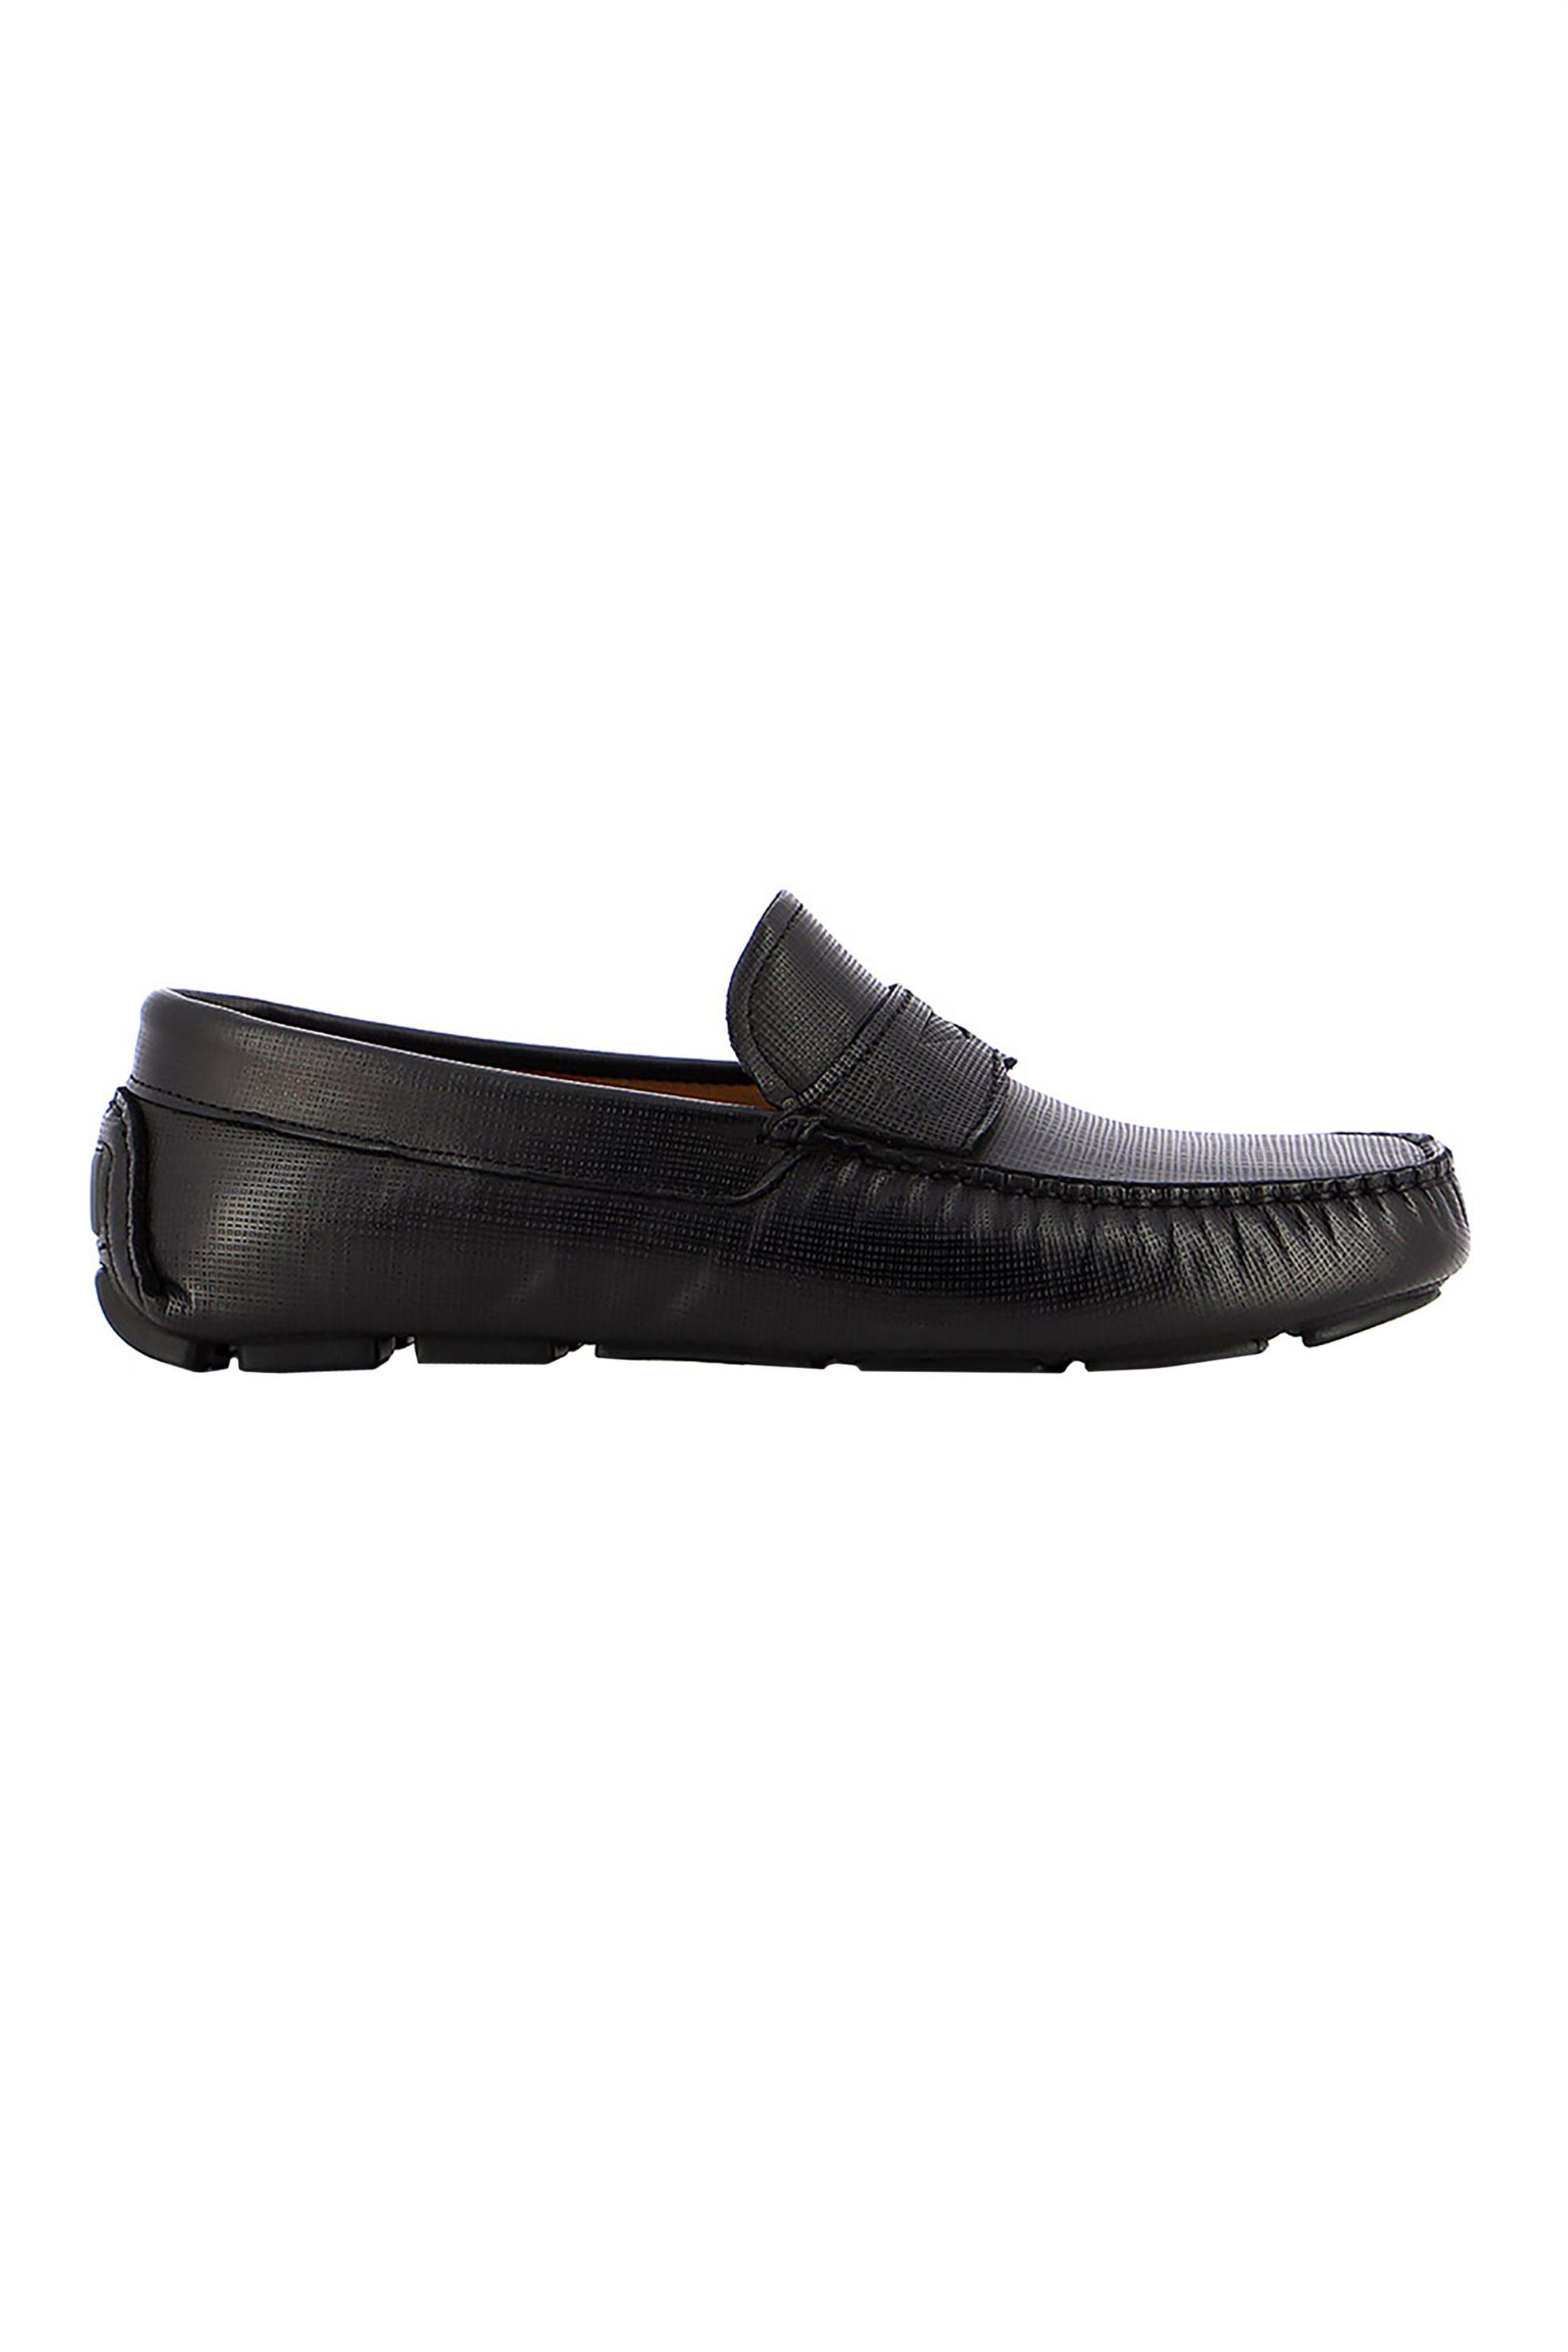 Boss Shoes ανδρικά δερμάτινα μοκασίνια με ανάγλυφο σχέδιο – Q5784 CHAVEZ – Καφέ